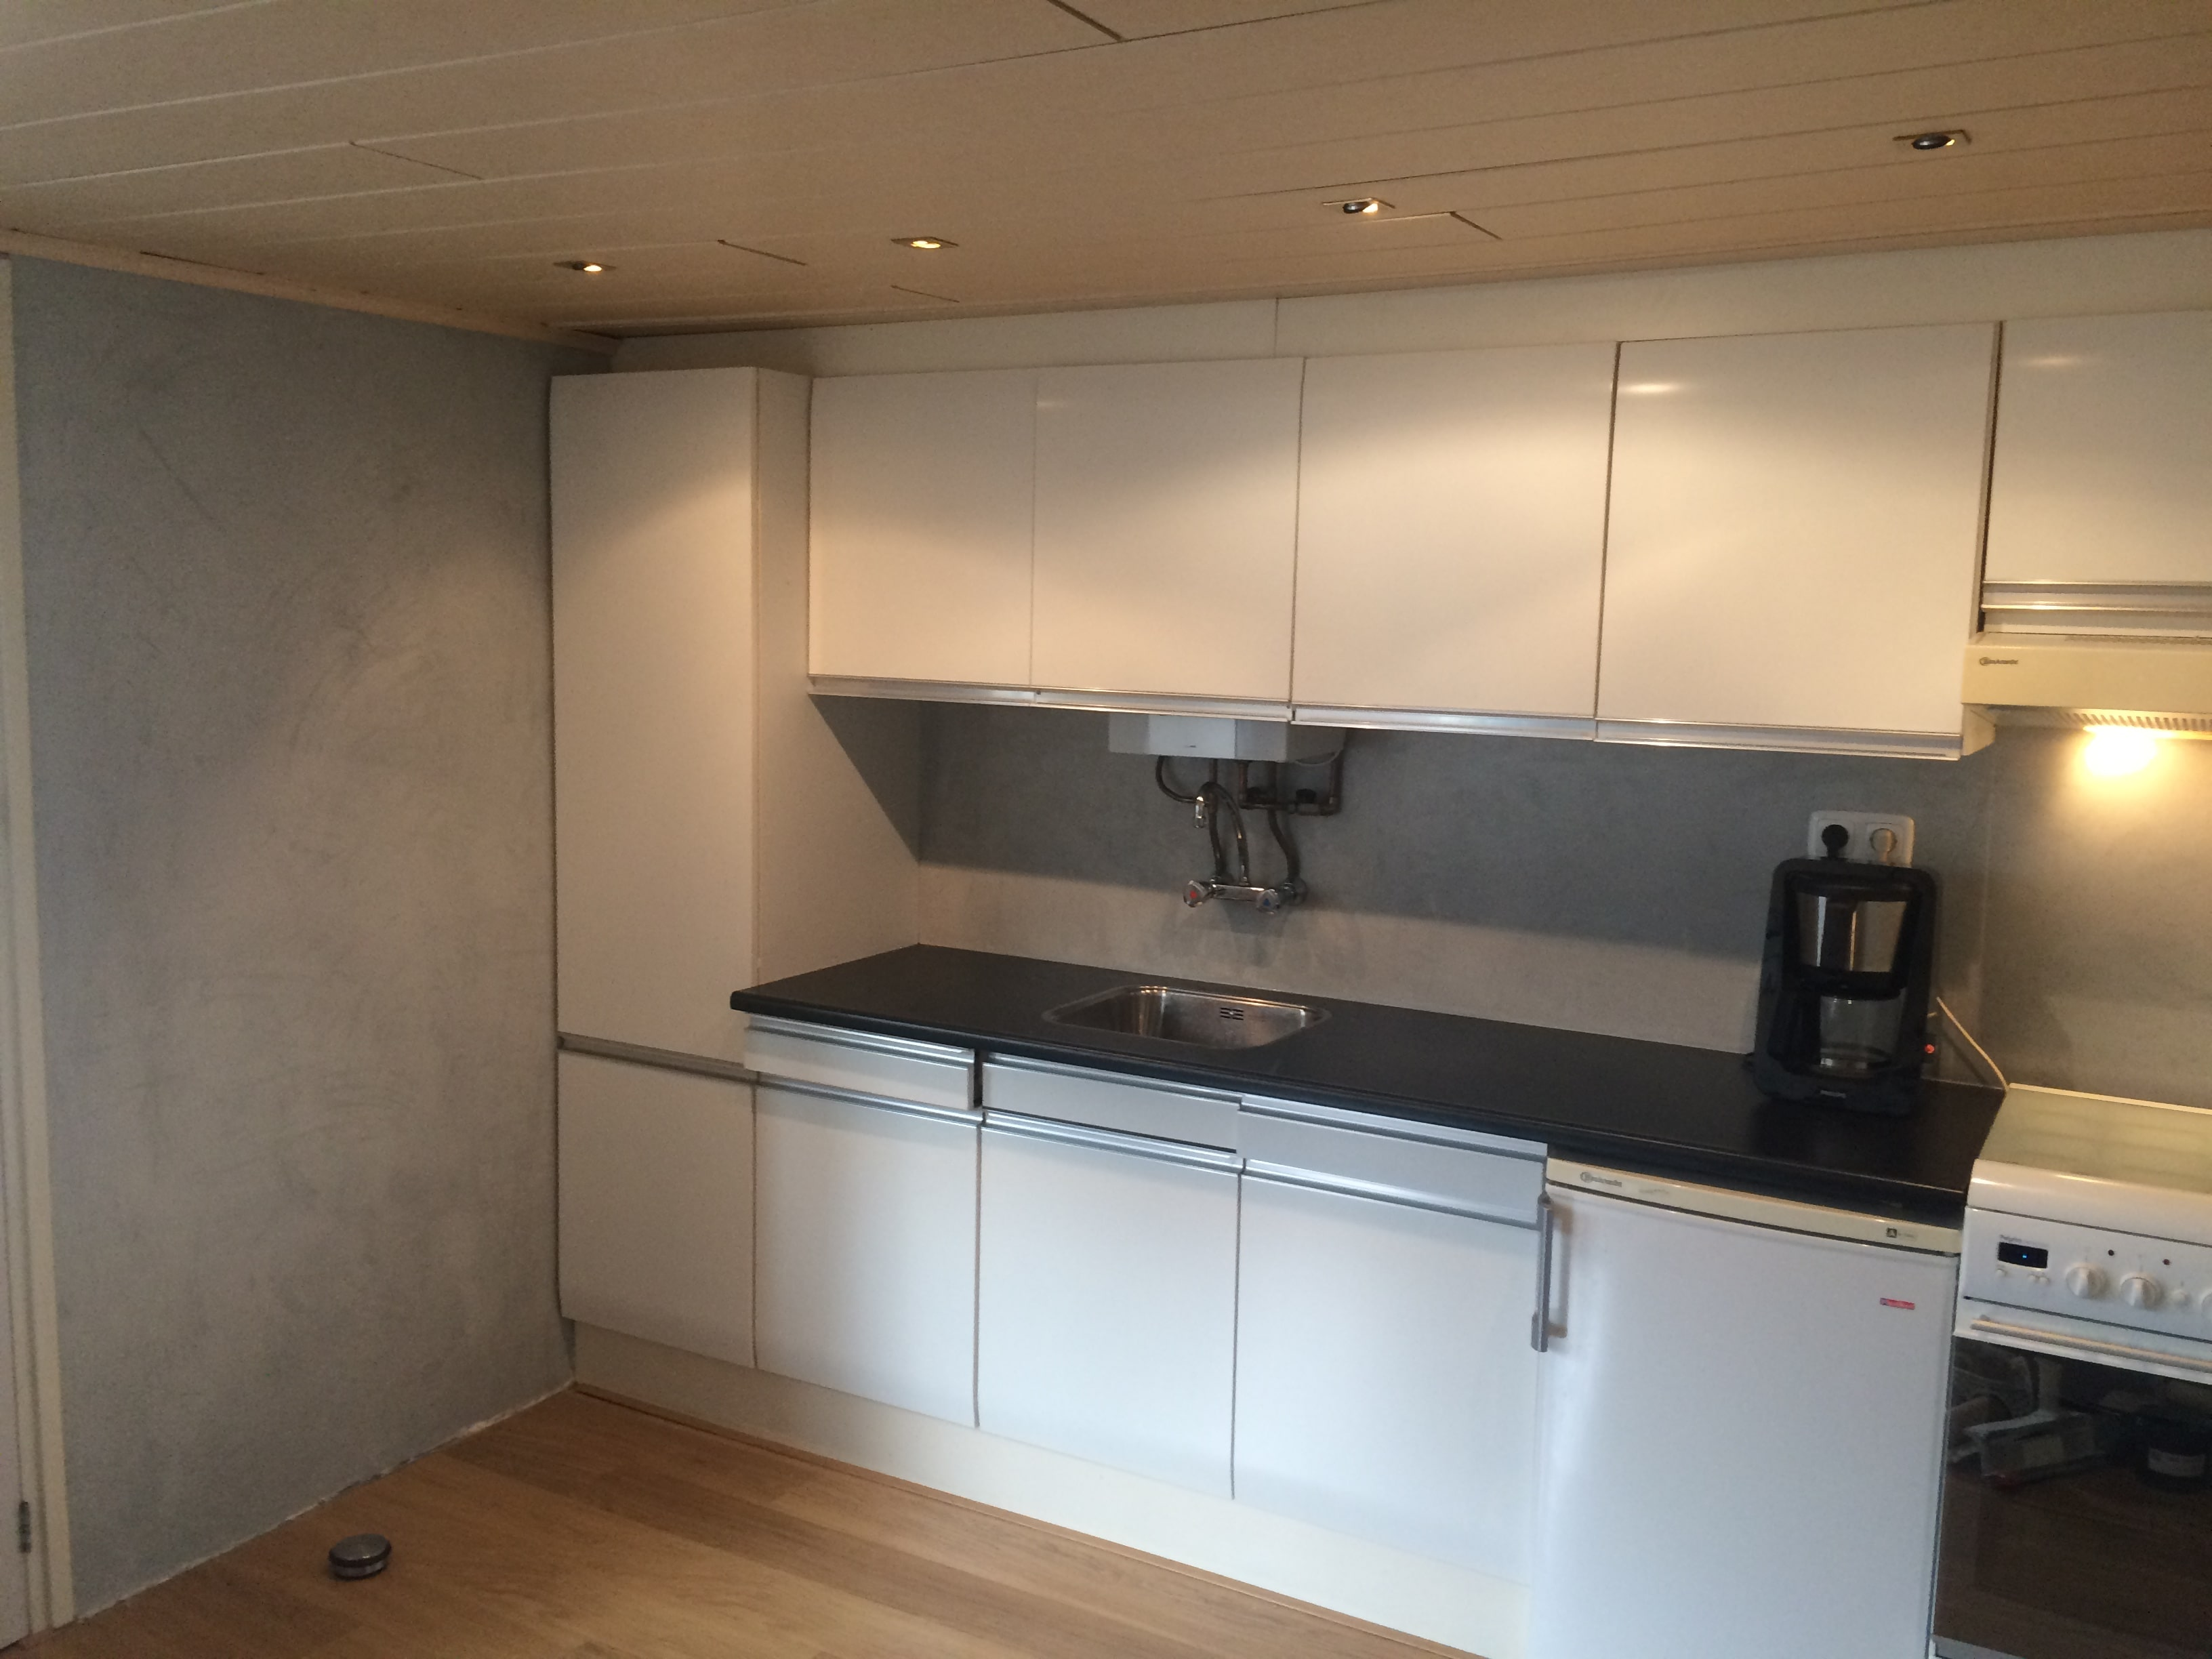 Restyle keuken keukenarchitectuur - Restyle houten trap ...